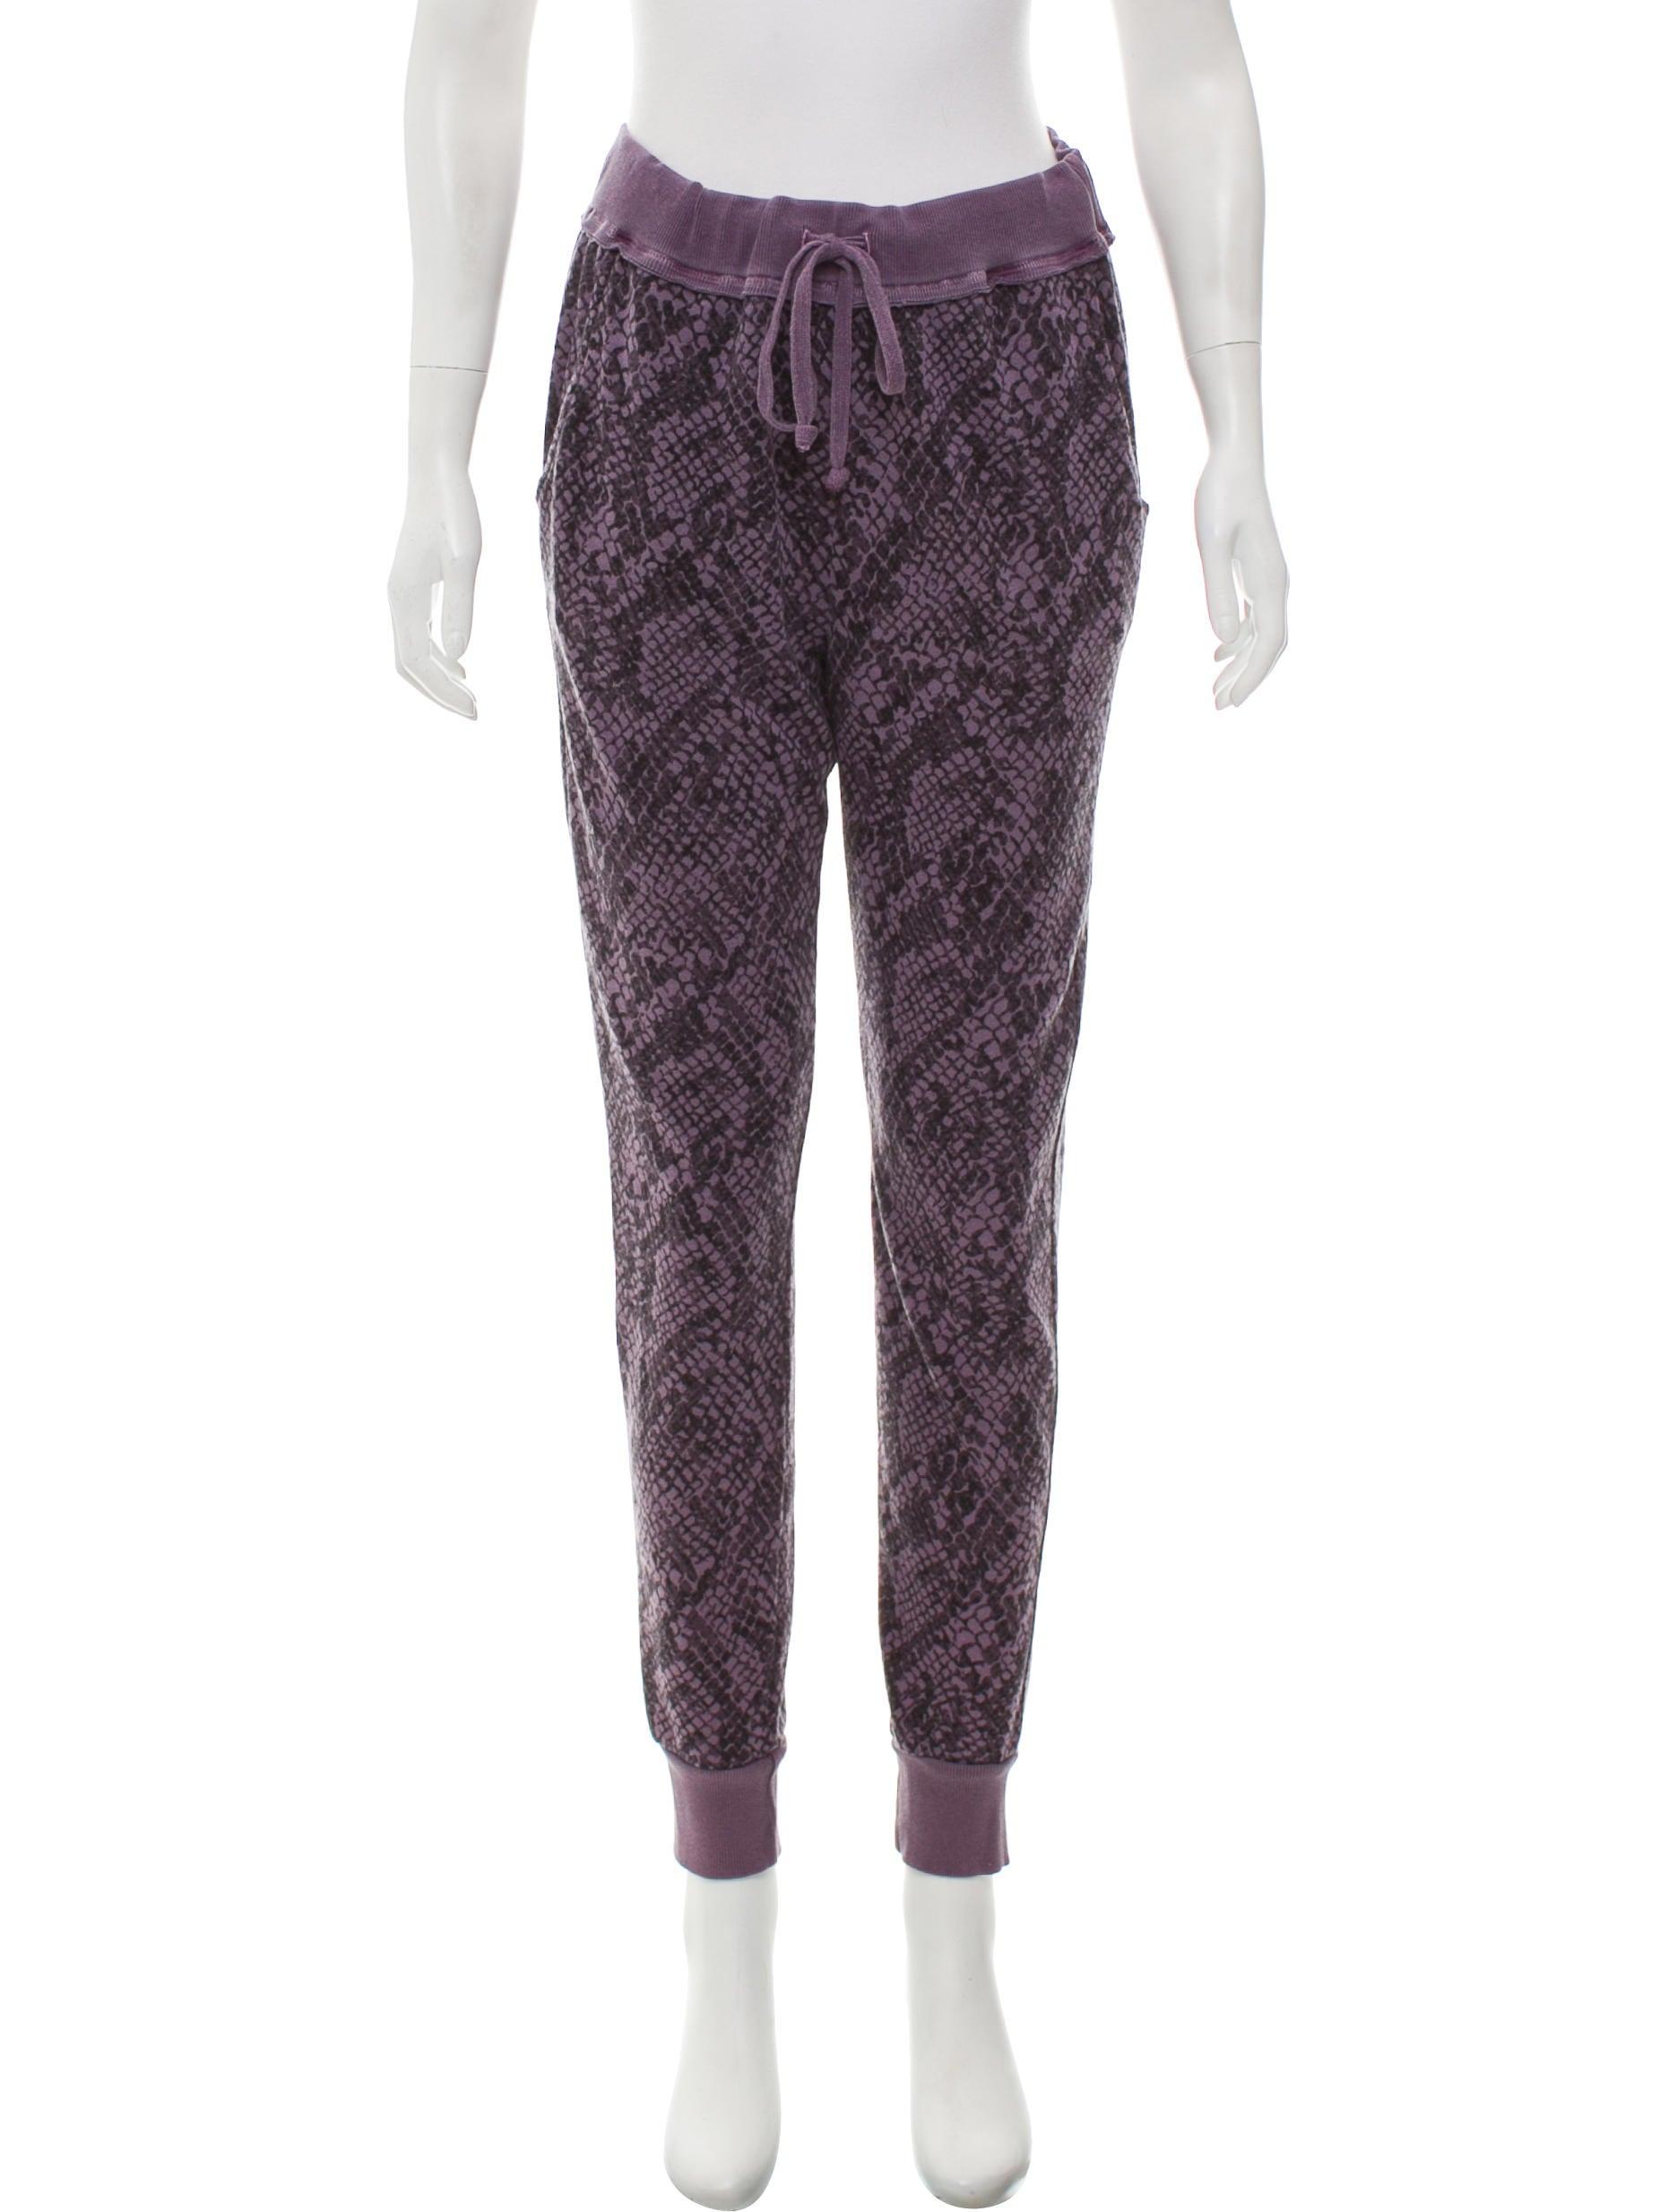 Outlet Big Sale Splendid High-Rise Pants w/ Tags Cheap Sale Eastbay NJoI9mbZ12